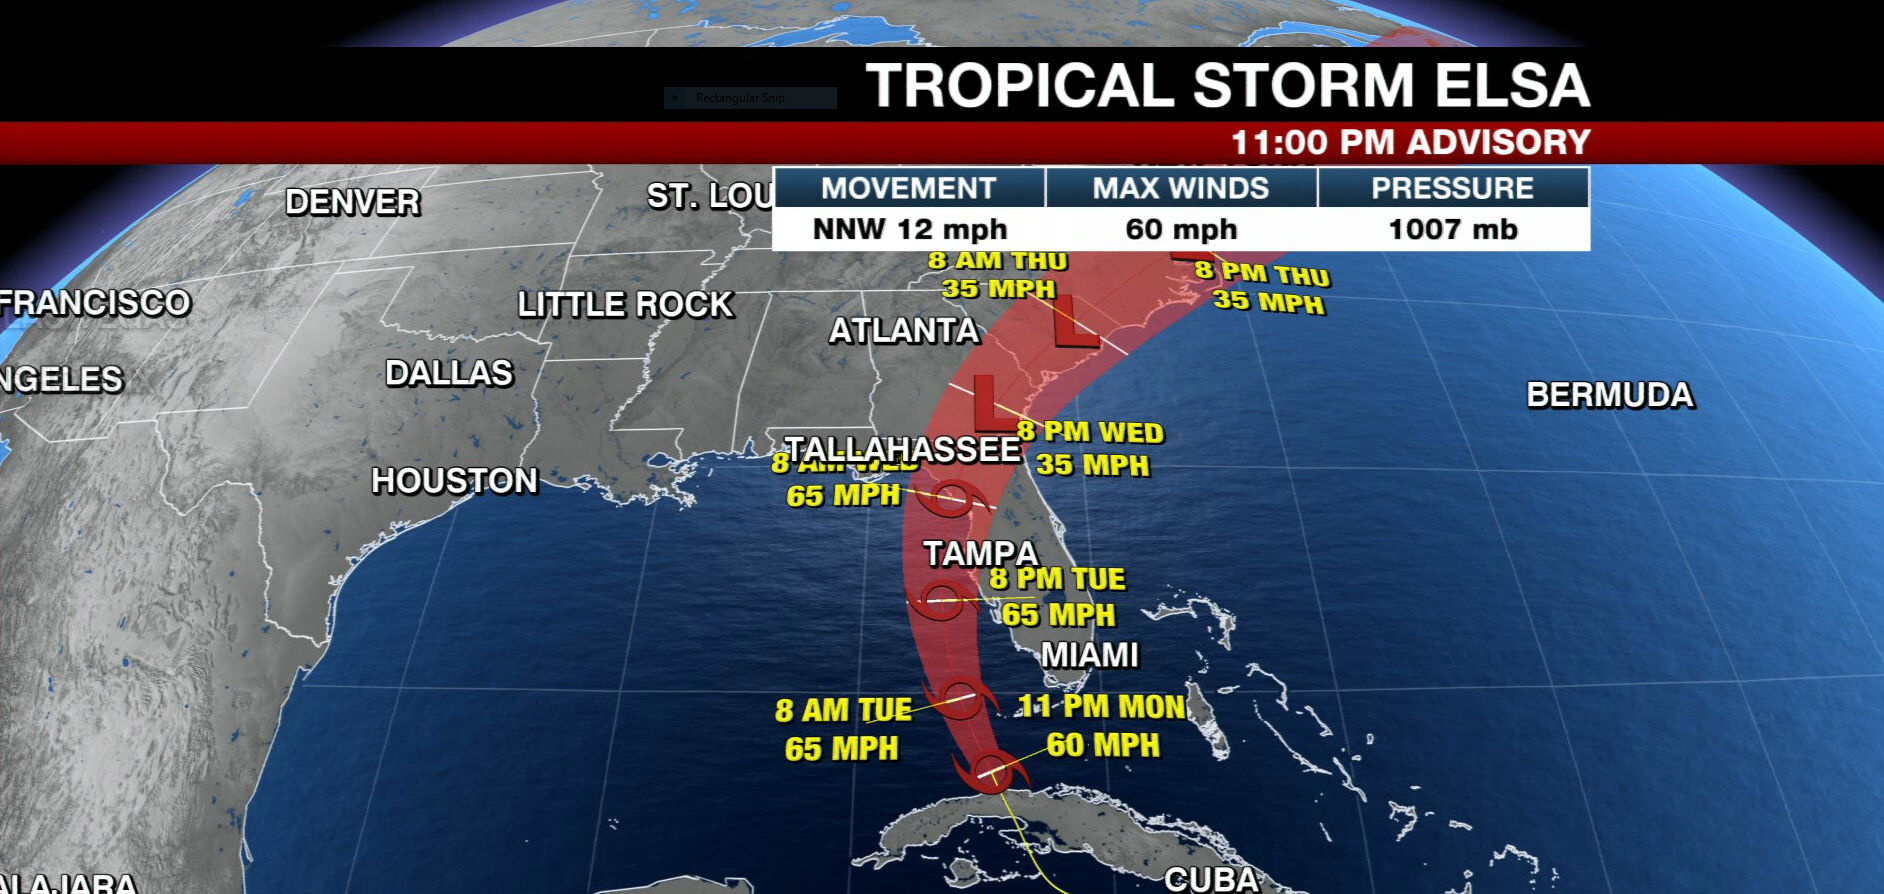 Tracking the Tropics: Tropical Storm Elsa emerges off coast of Cuba, back over water